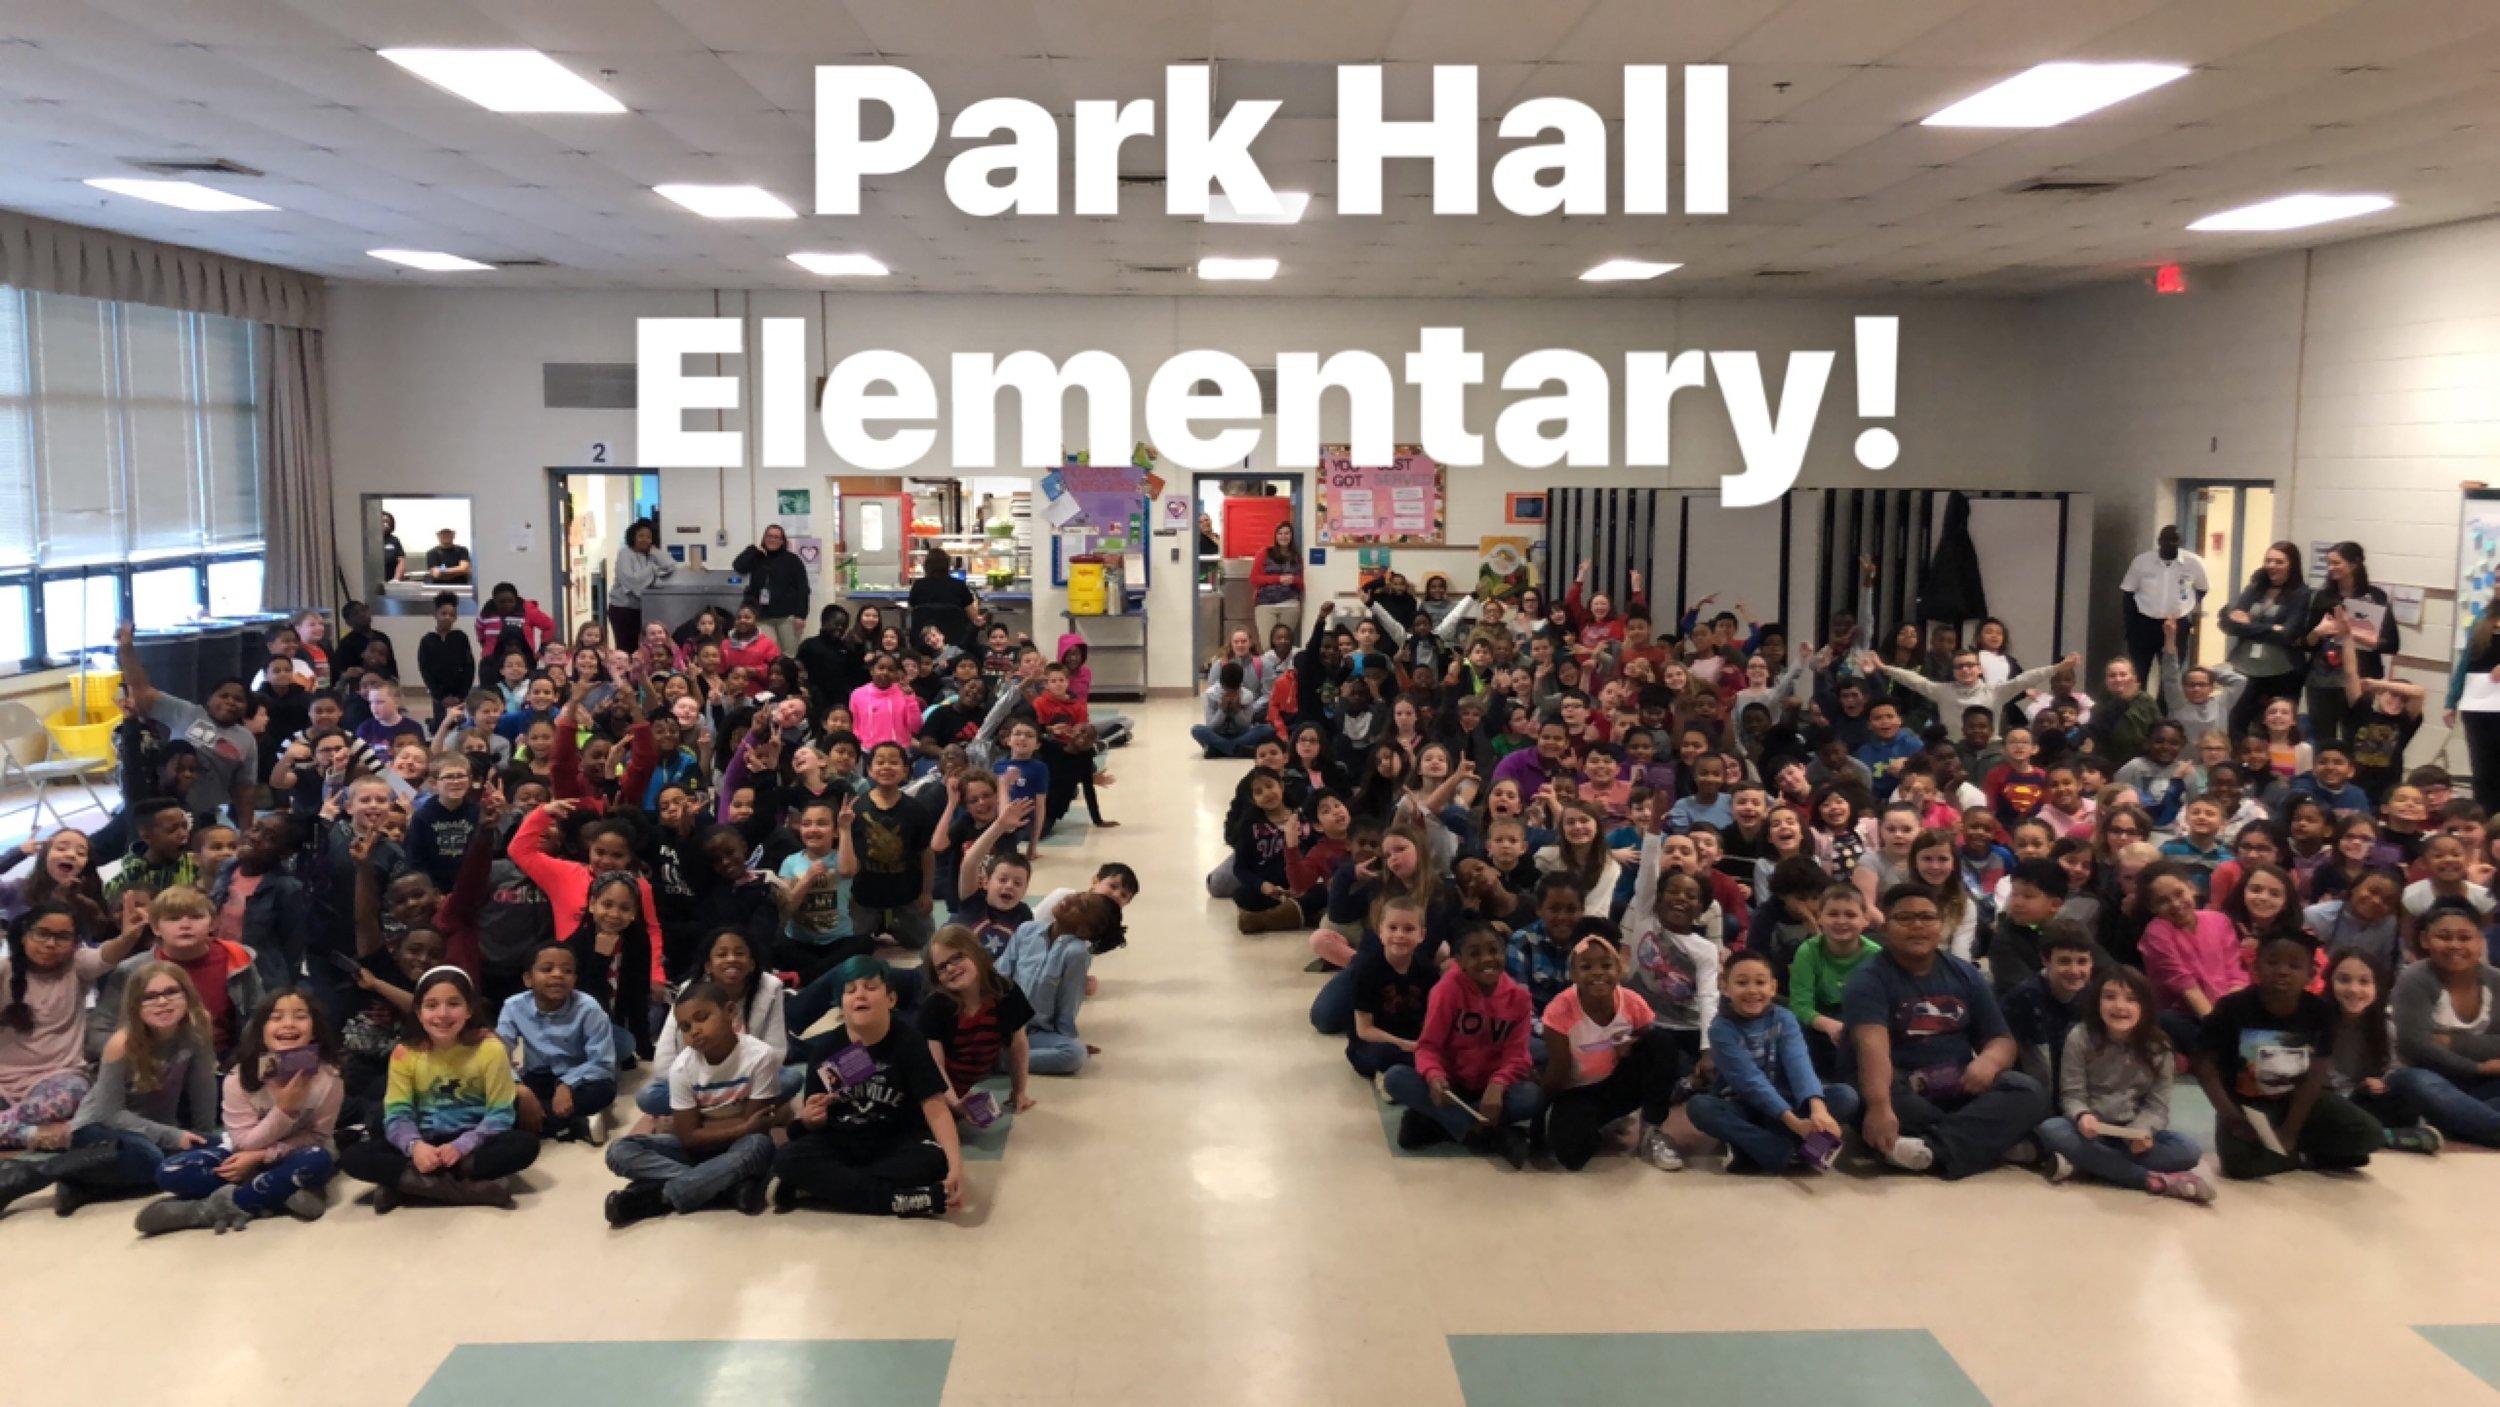 Park Hall Elementary